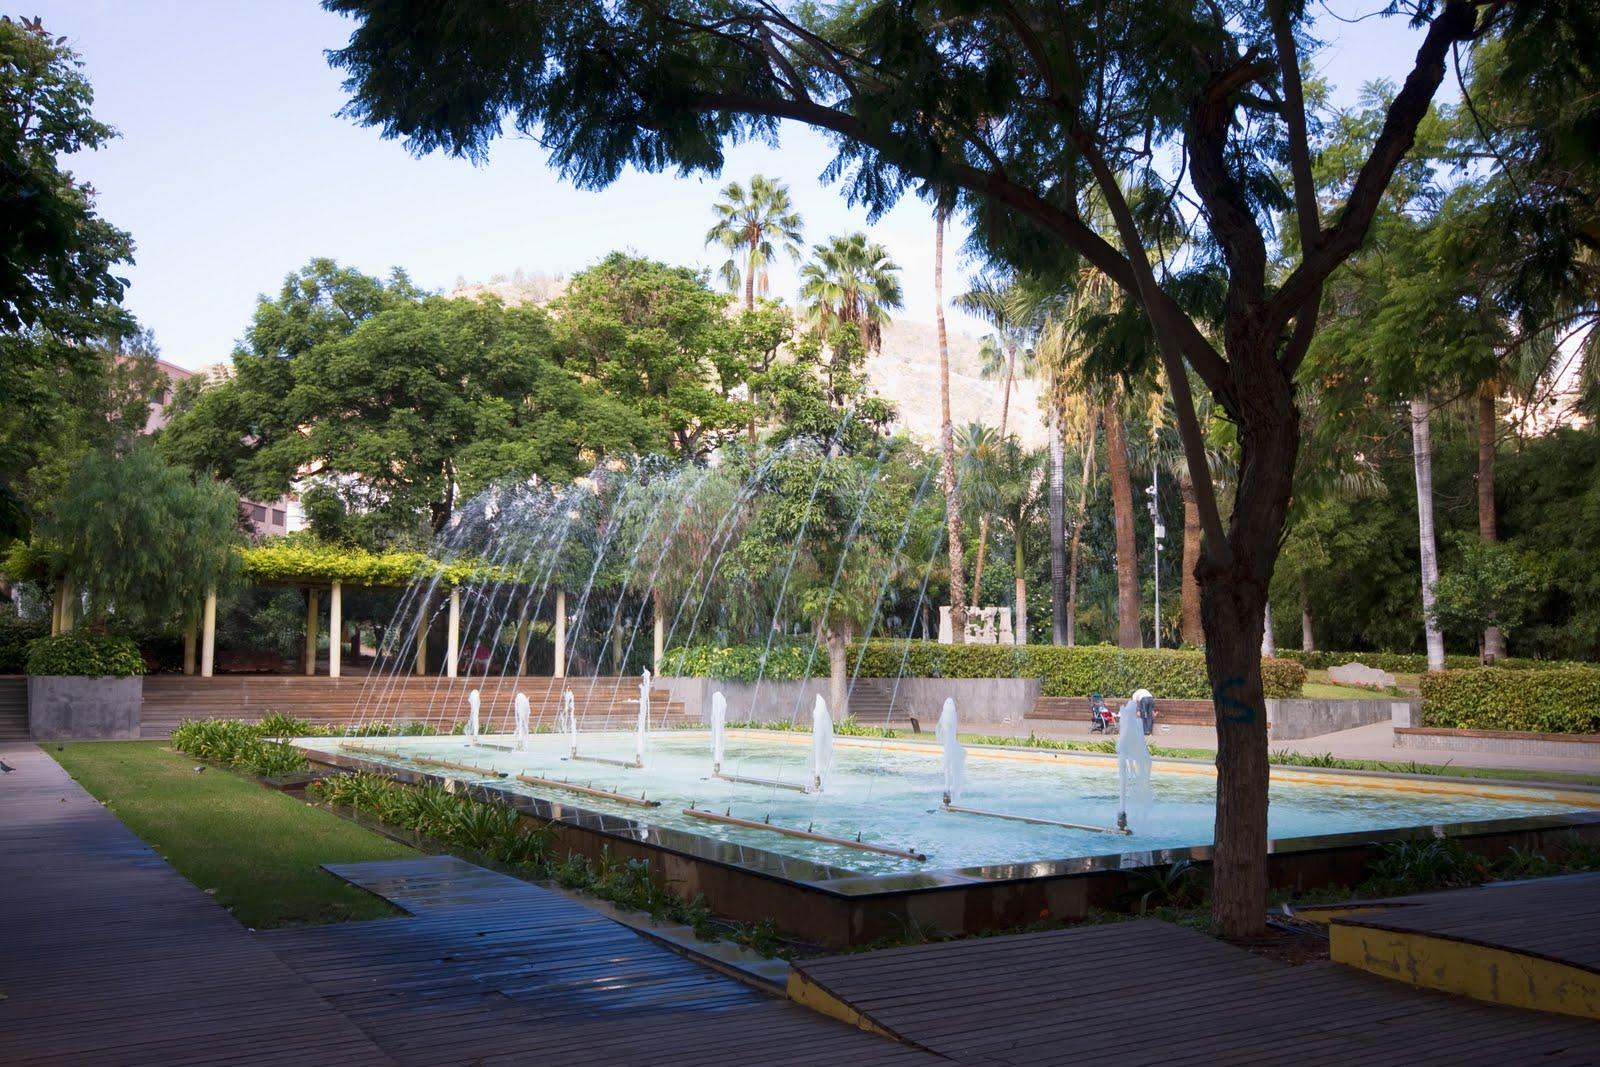 Imagenes de tenerife descubrela parque municipal - Parques infantiles santa cruz de tenerife ...